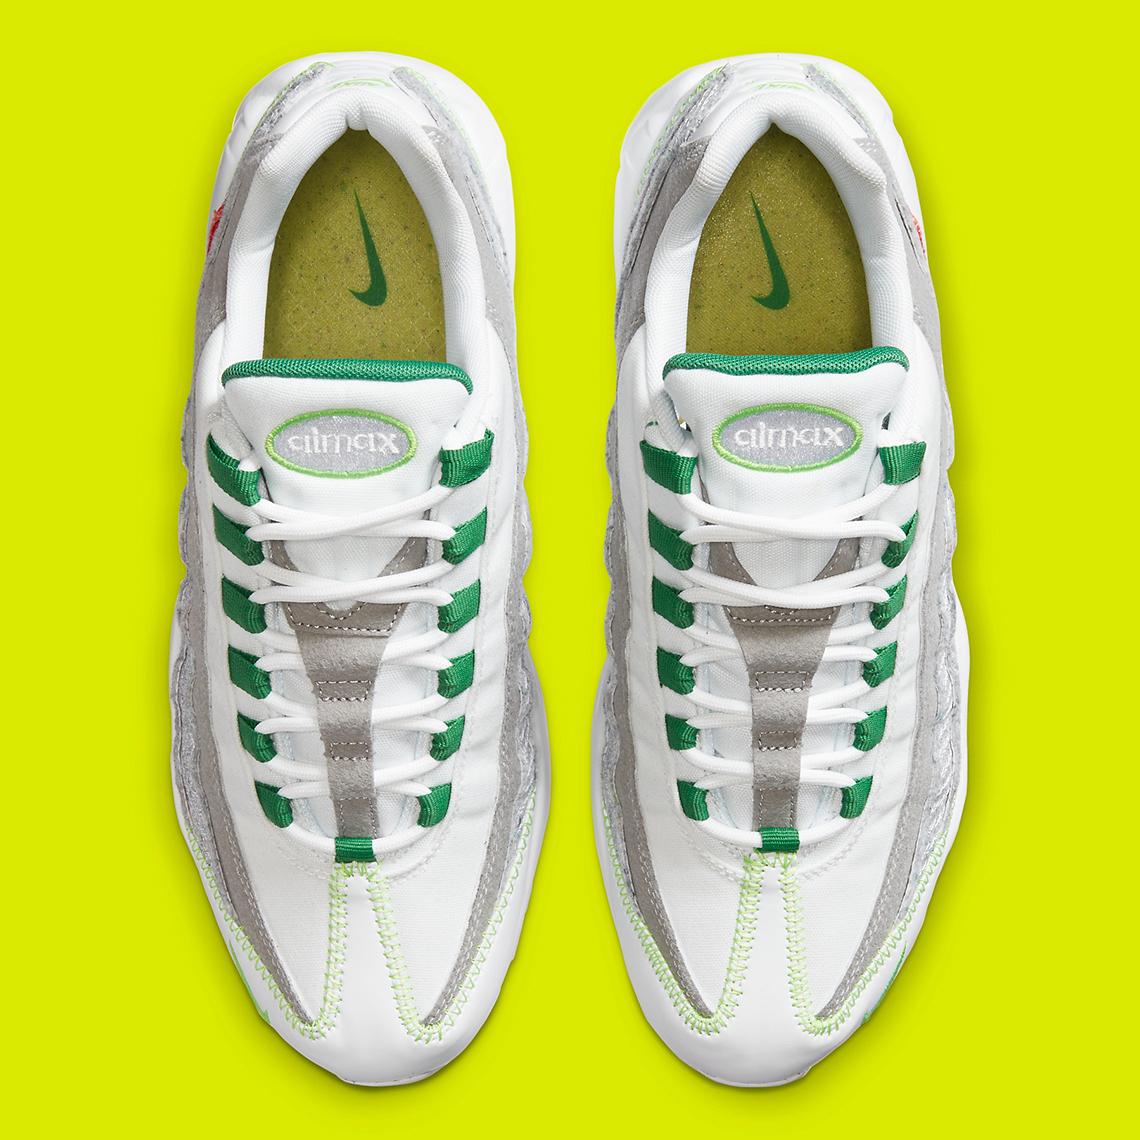 Nike Air Max 95 NRG ''Classic Green'' - CU5517-100